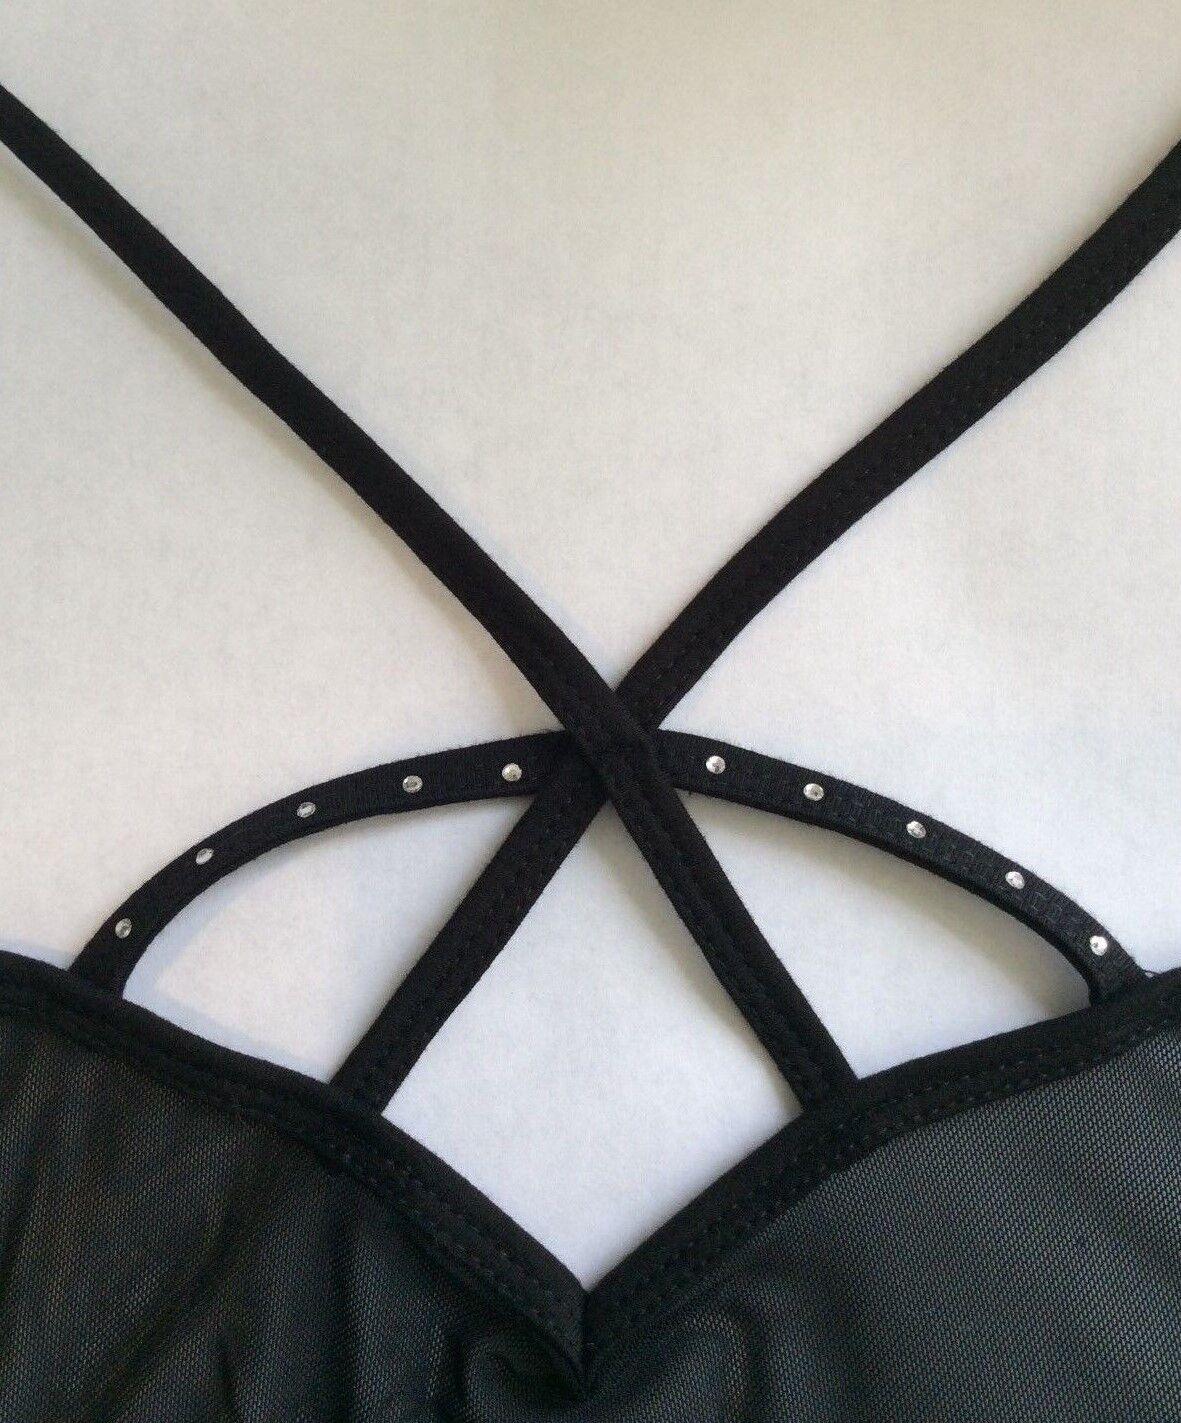 Diamante Leotard.Rhinestone Gymnastic Dance wear UK Black Ballet Bodysuit.6-15Y